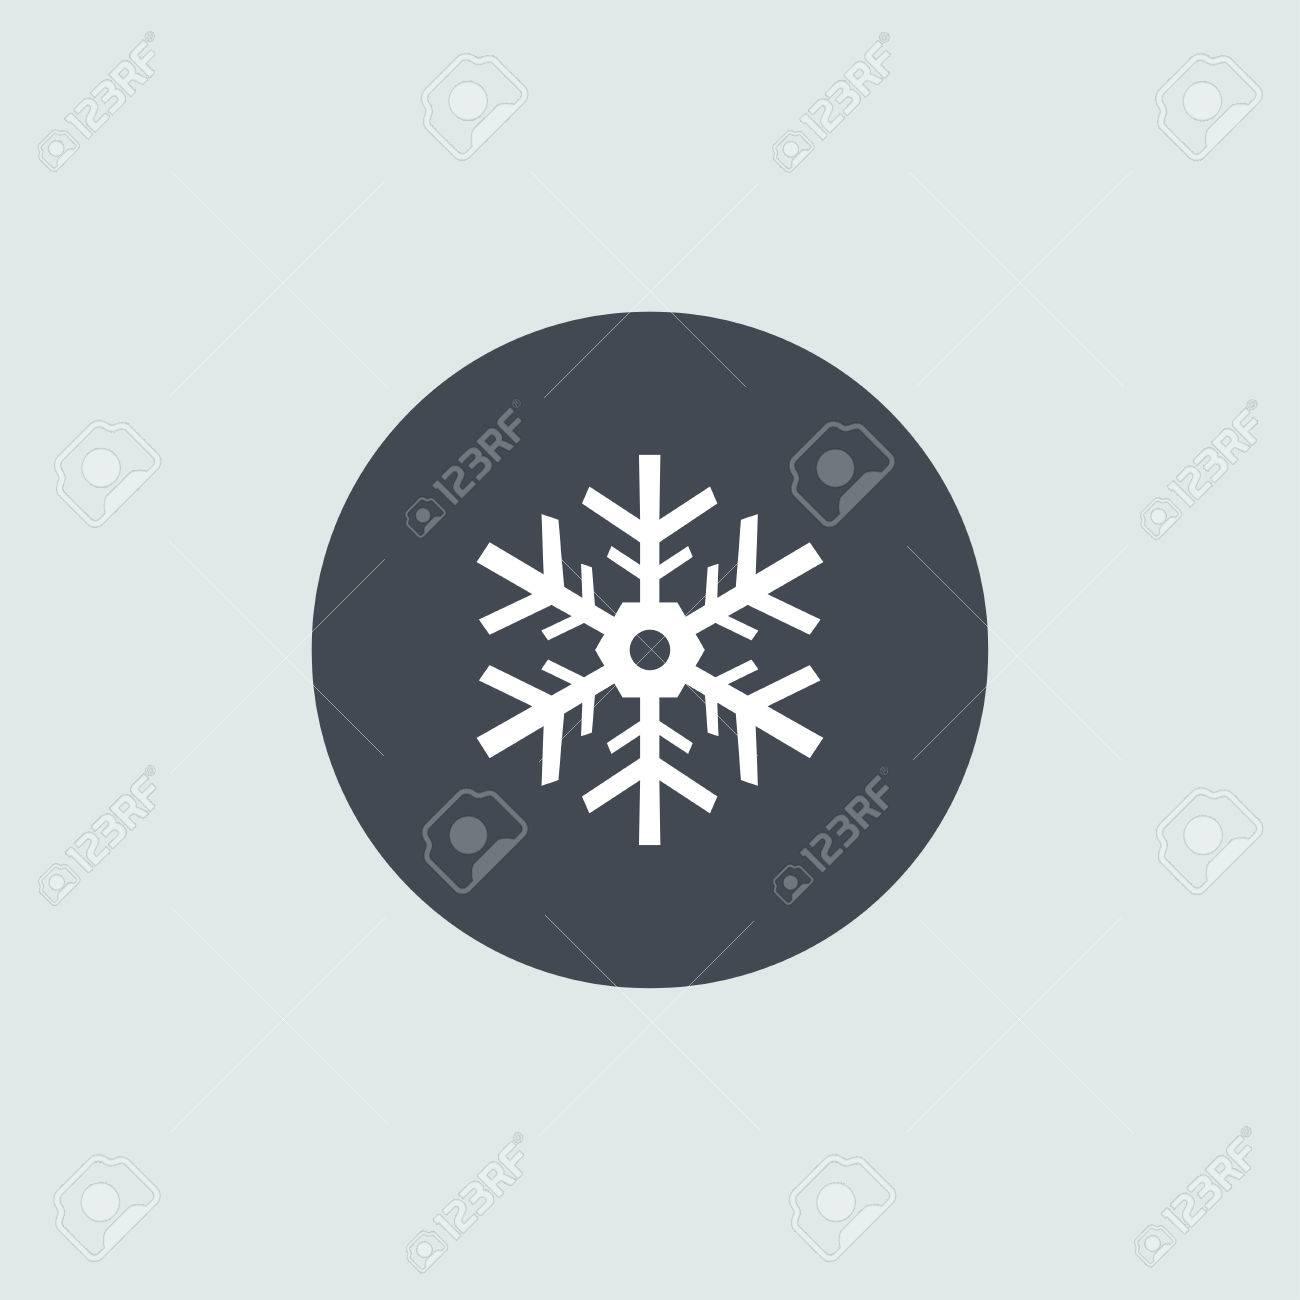 Icon Christmas snowflakes for holiday season. - 47450099